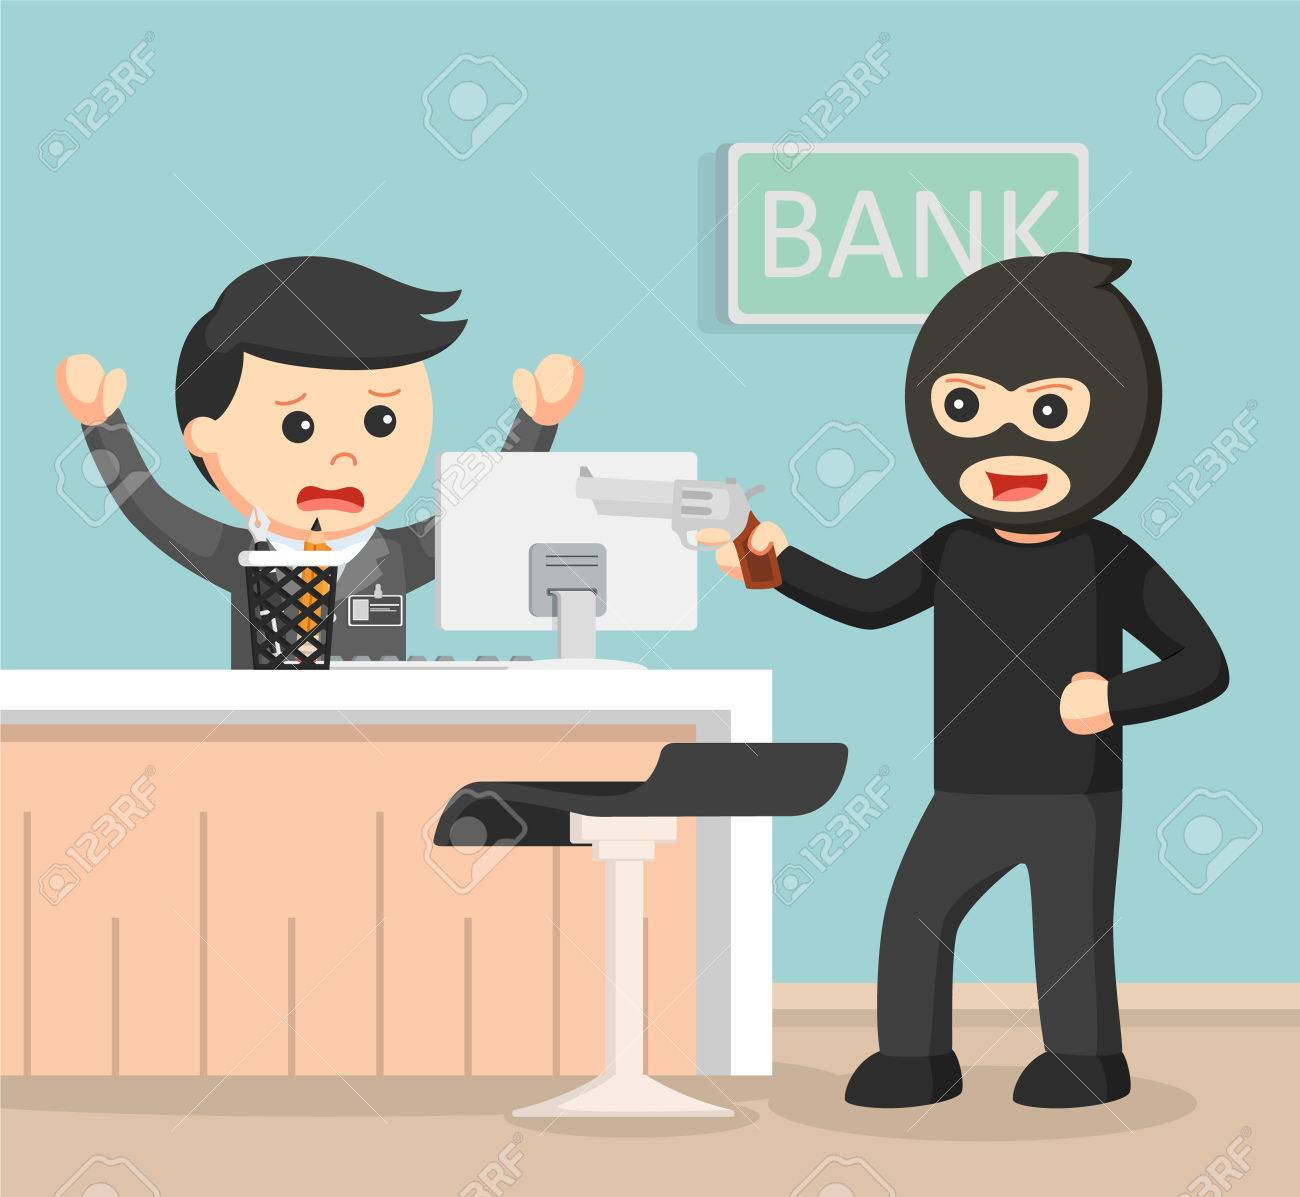 Bank Robbery Clip Art.